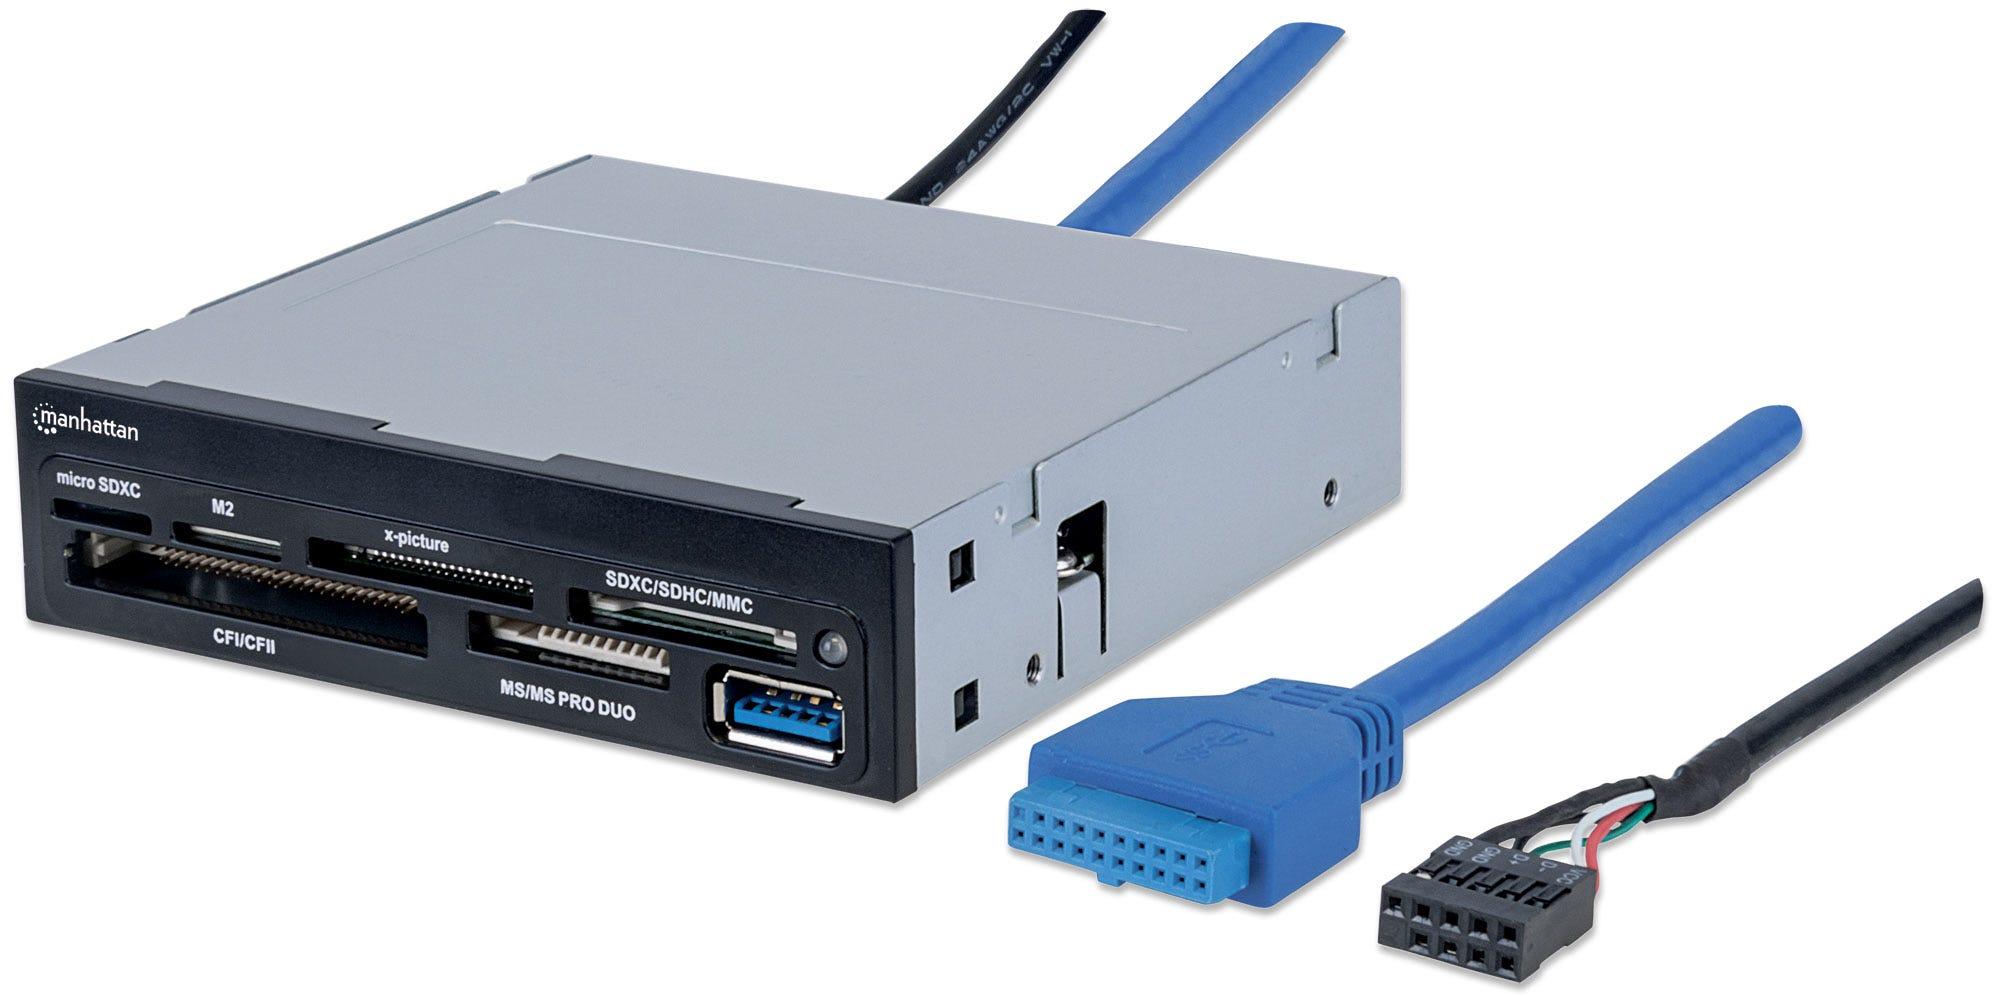 "Manhattan 3.5"" Bay Mount Expansion Panel, 1x USB-A port, Multi-Card Reader/Writer 48-in-1, 5 Gbps (USB 3.2 Gen1 aka USB 3.0), SuperSpeed USB, Black, Three Year Warranty, Box"